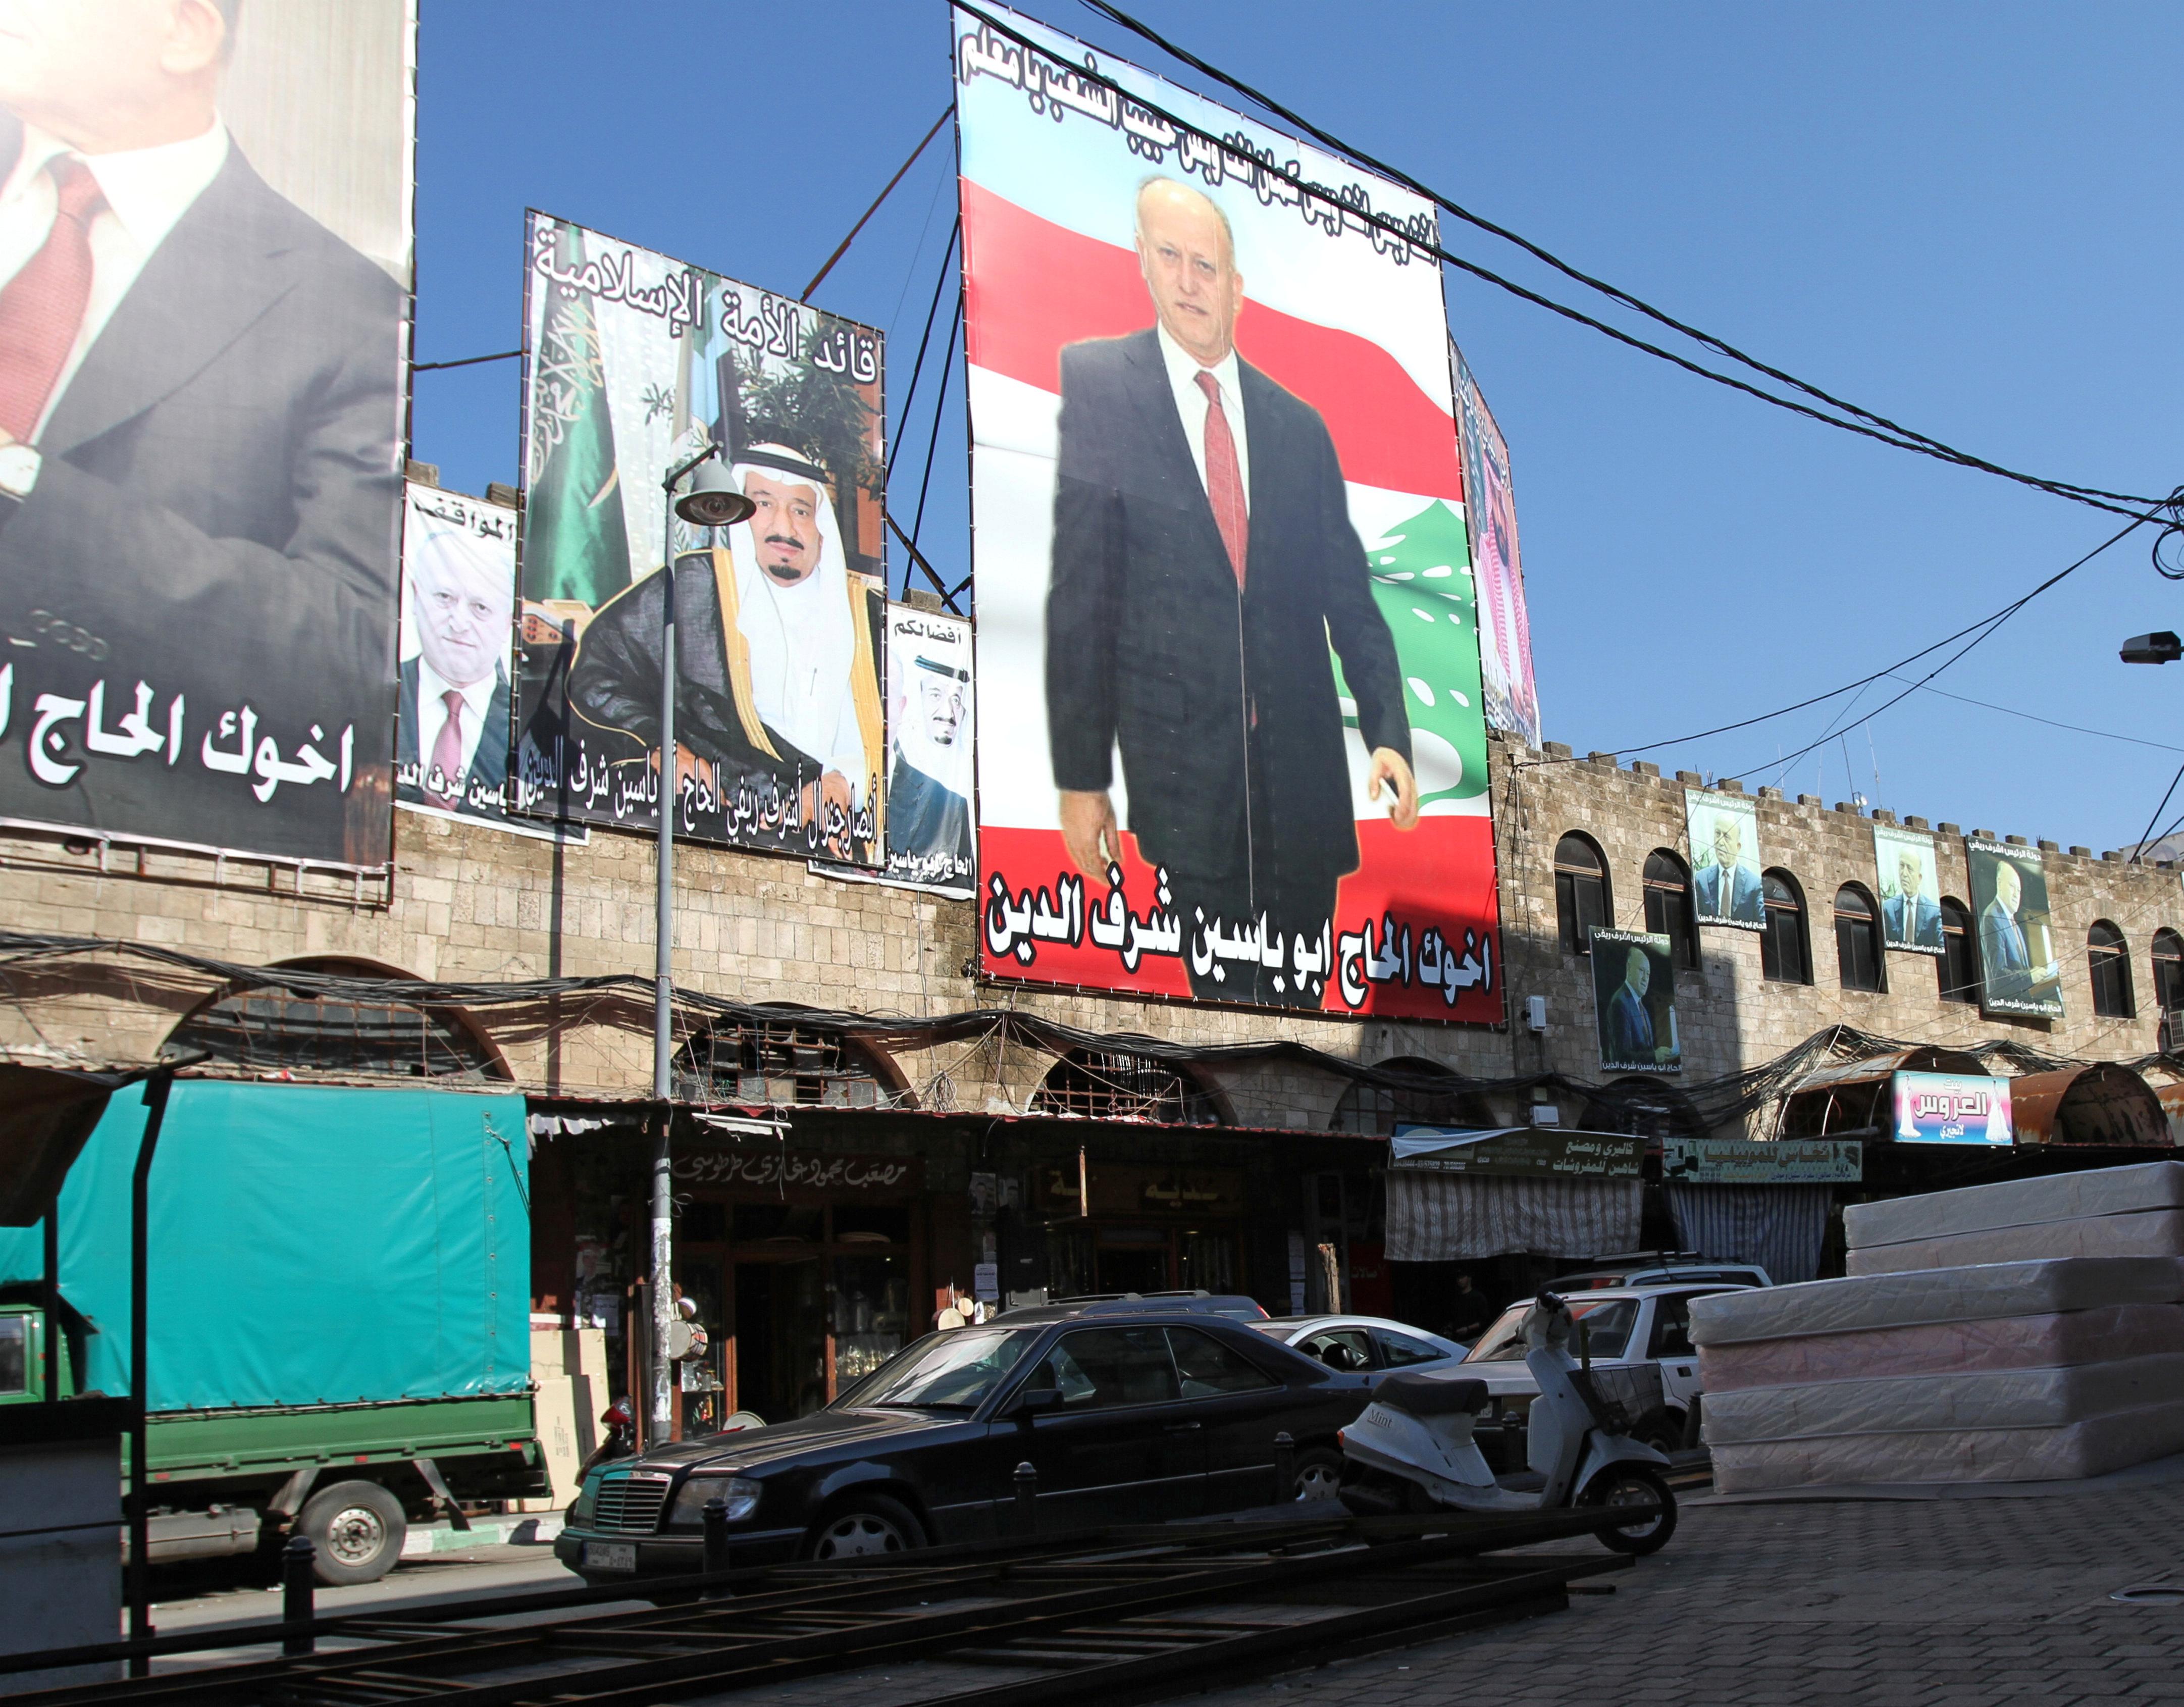 A poster depicting Saudi Arabia's King Salman bin Abdulaziz Al Saud is seen in Tripoli, northern Lebanon, November 7, 2017. REUTERS/Omar Ibrahim - RC147020BF90